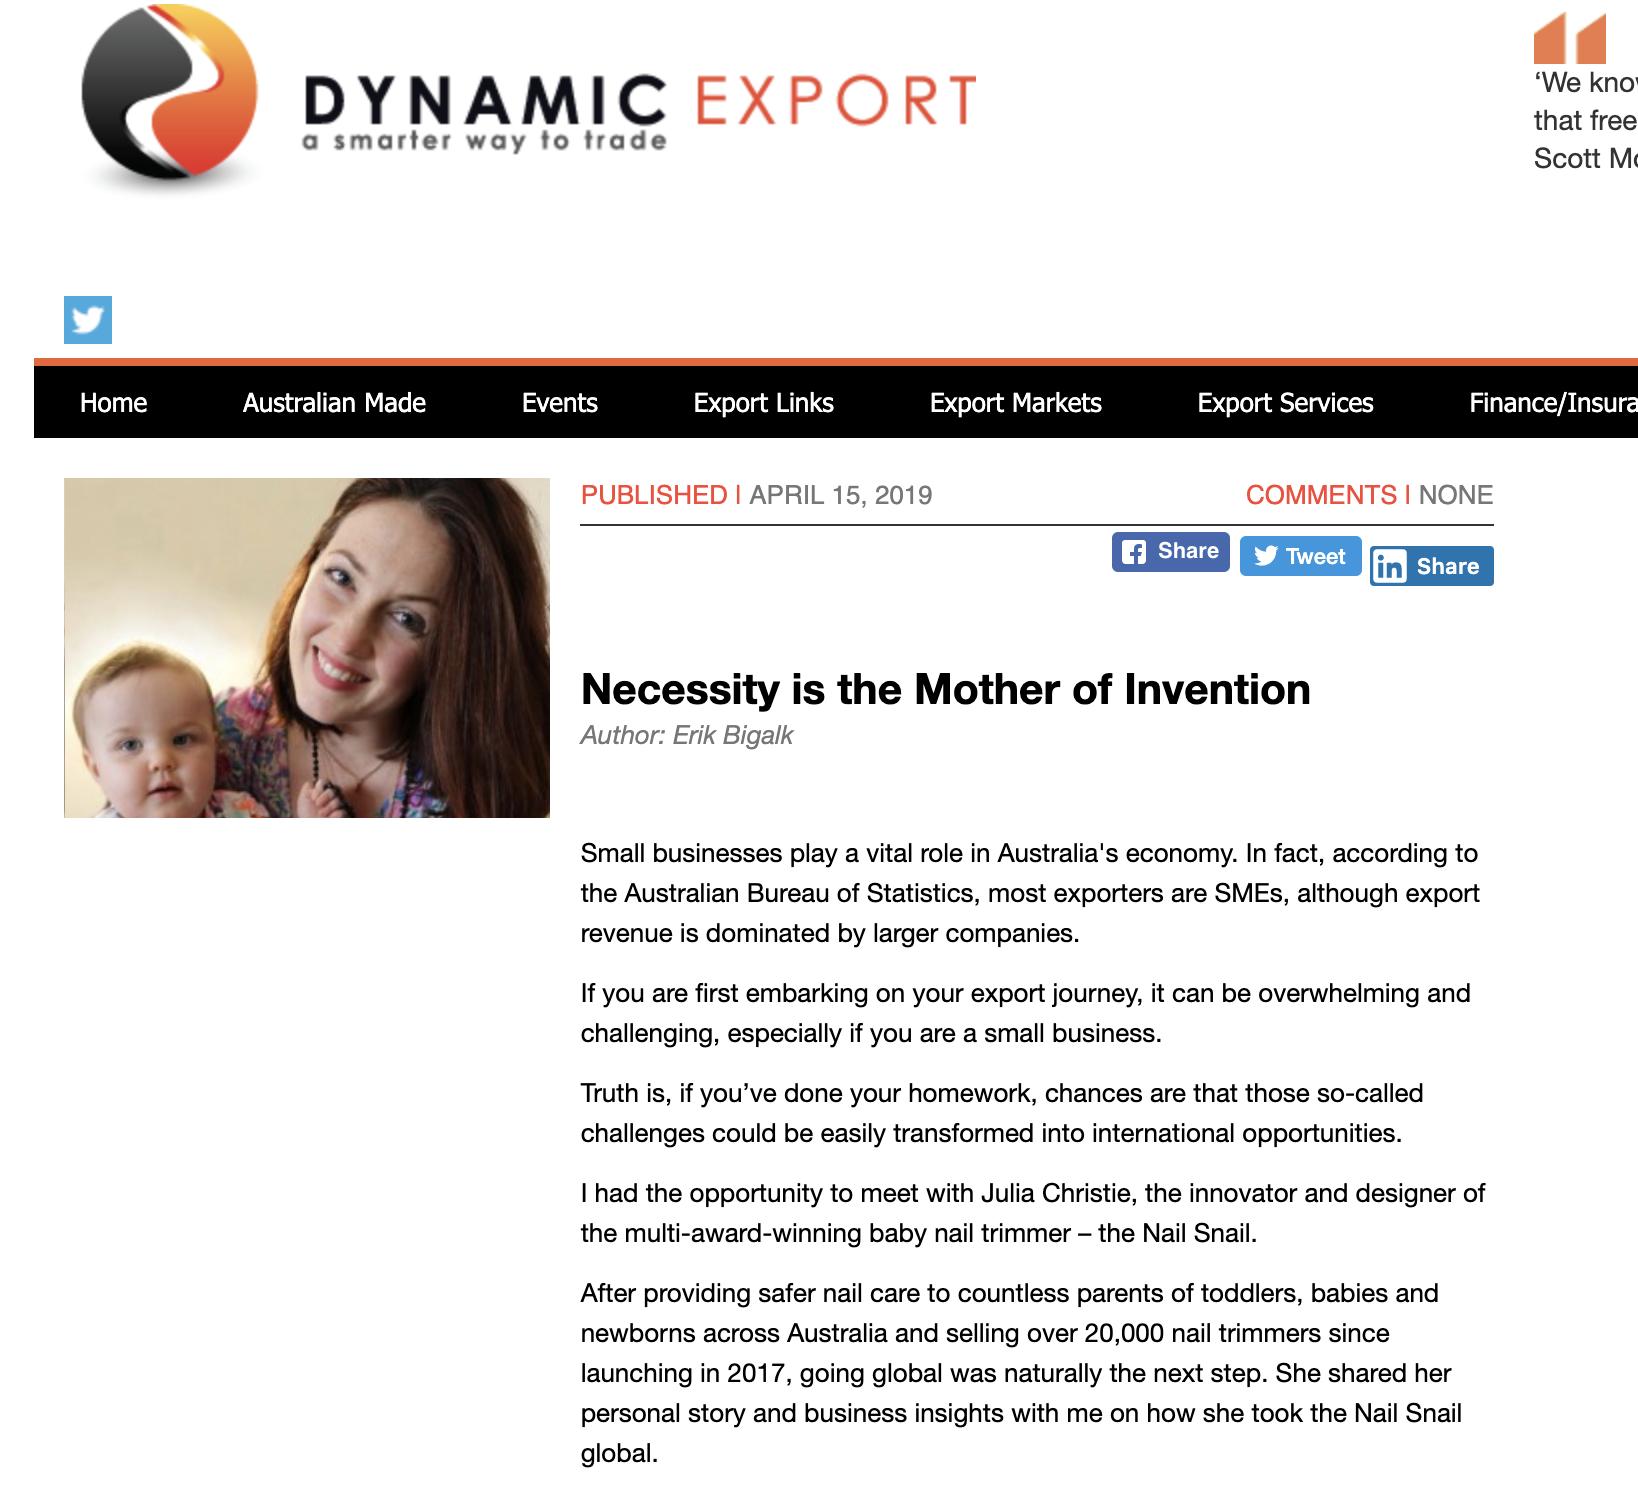 Dynamic Export